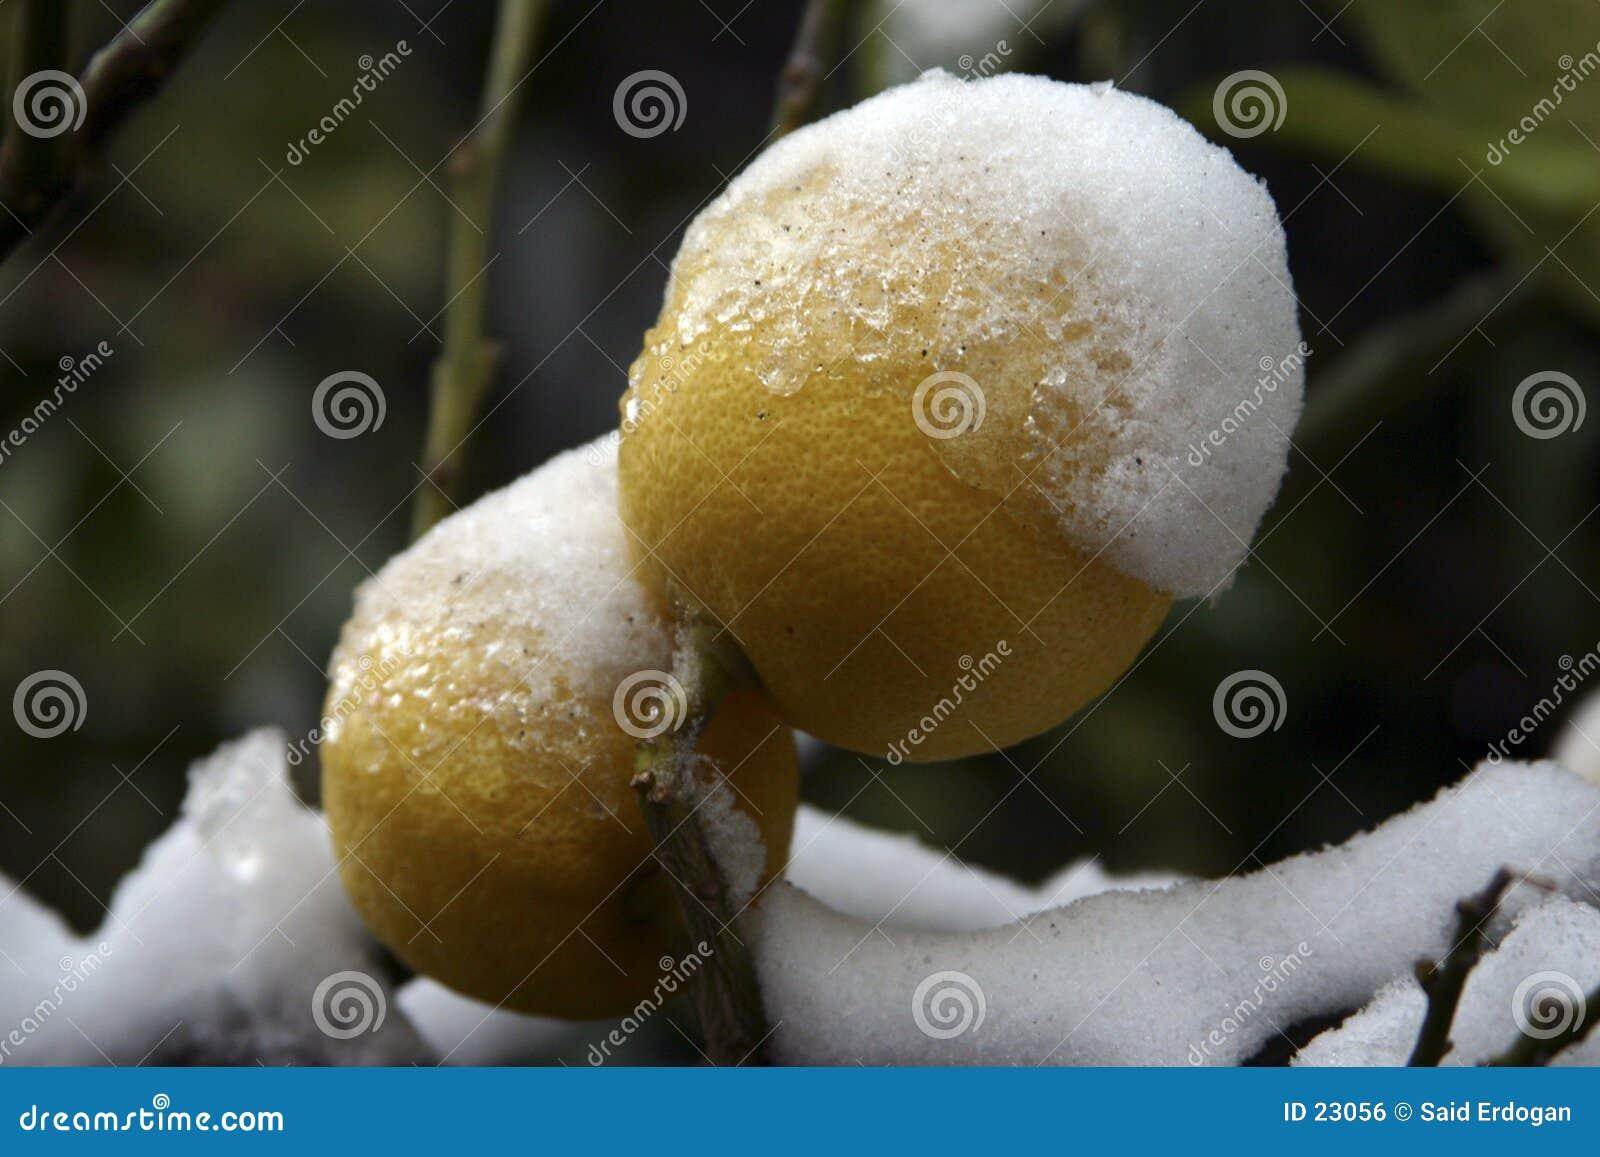 寒冷ii柠檬